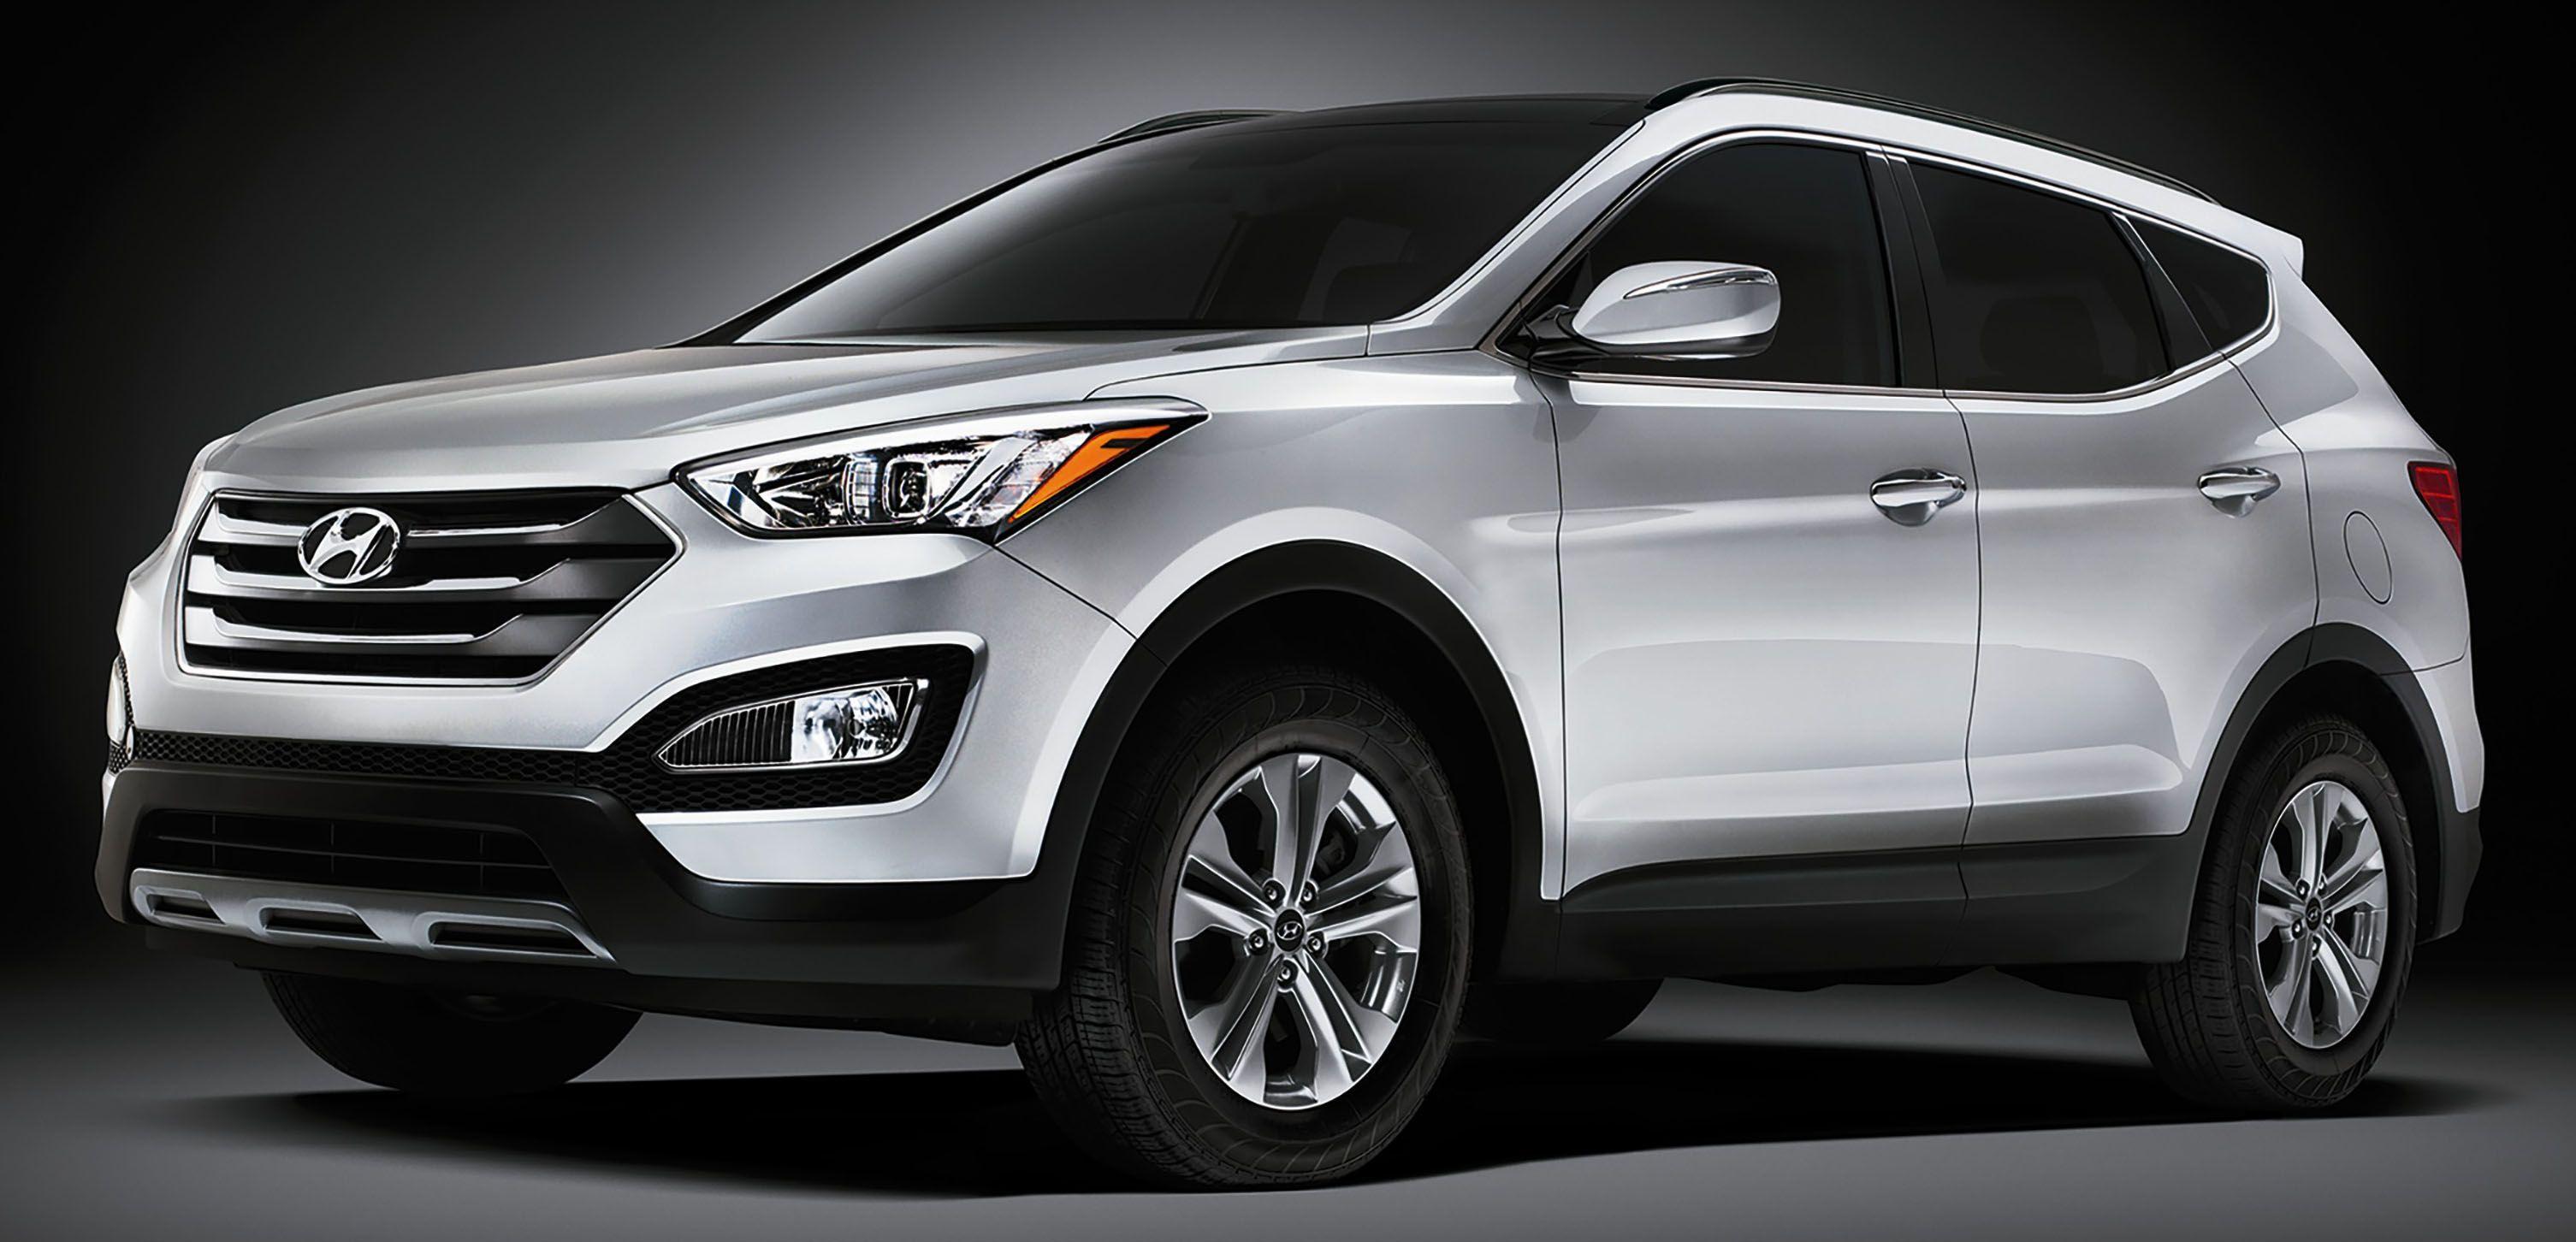 2015 Hyundai Santa Fe Wallpapers 2772 Wallpaper Wallsauto Com Hyundai Santa Fe Sport Santa Fe Sport Hyundai Santa Fe